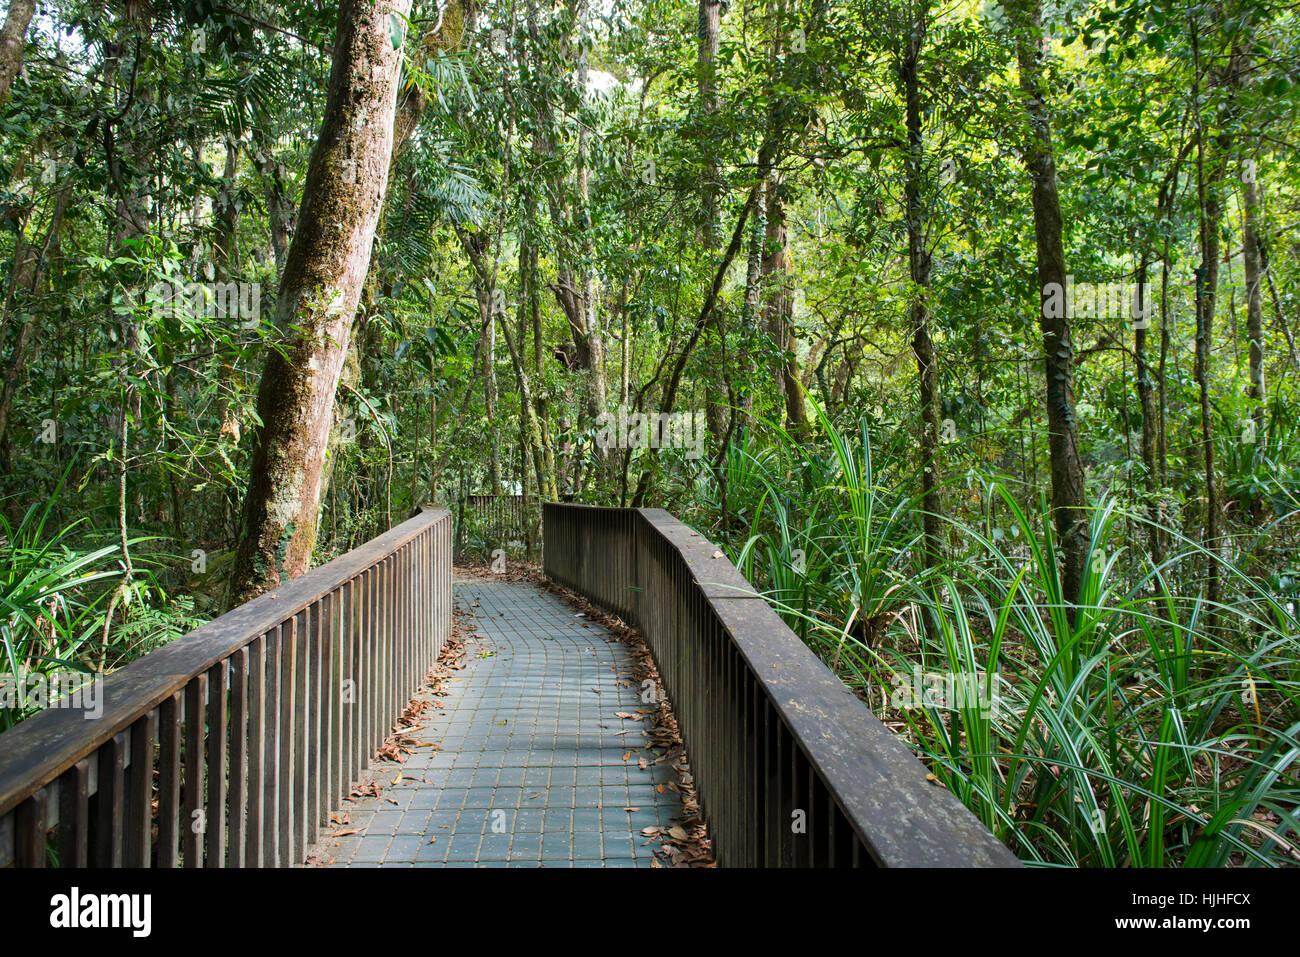 Boardwalk through the Rainforest at Mossman Gorge, Queensland Australia - Stock Image